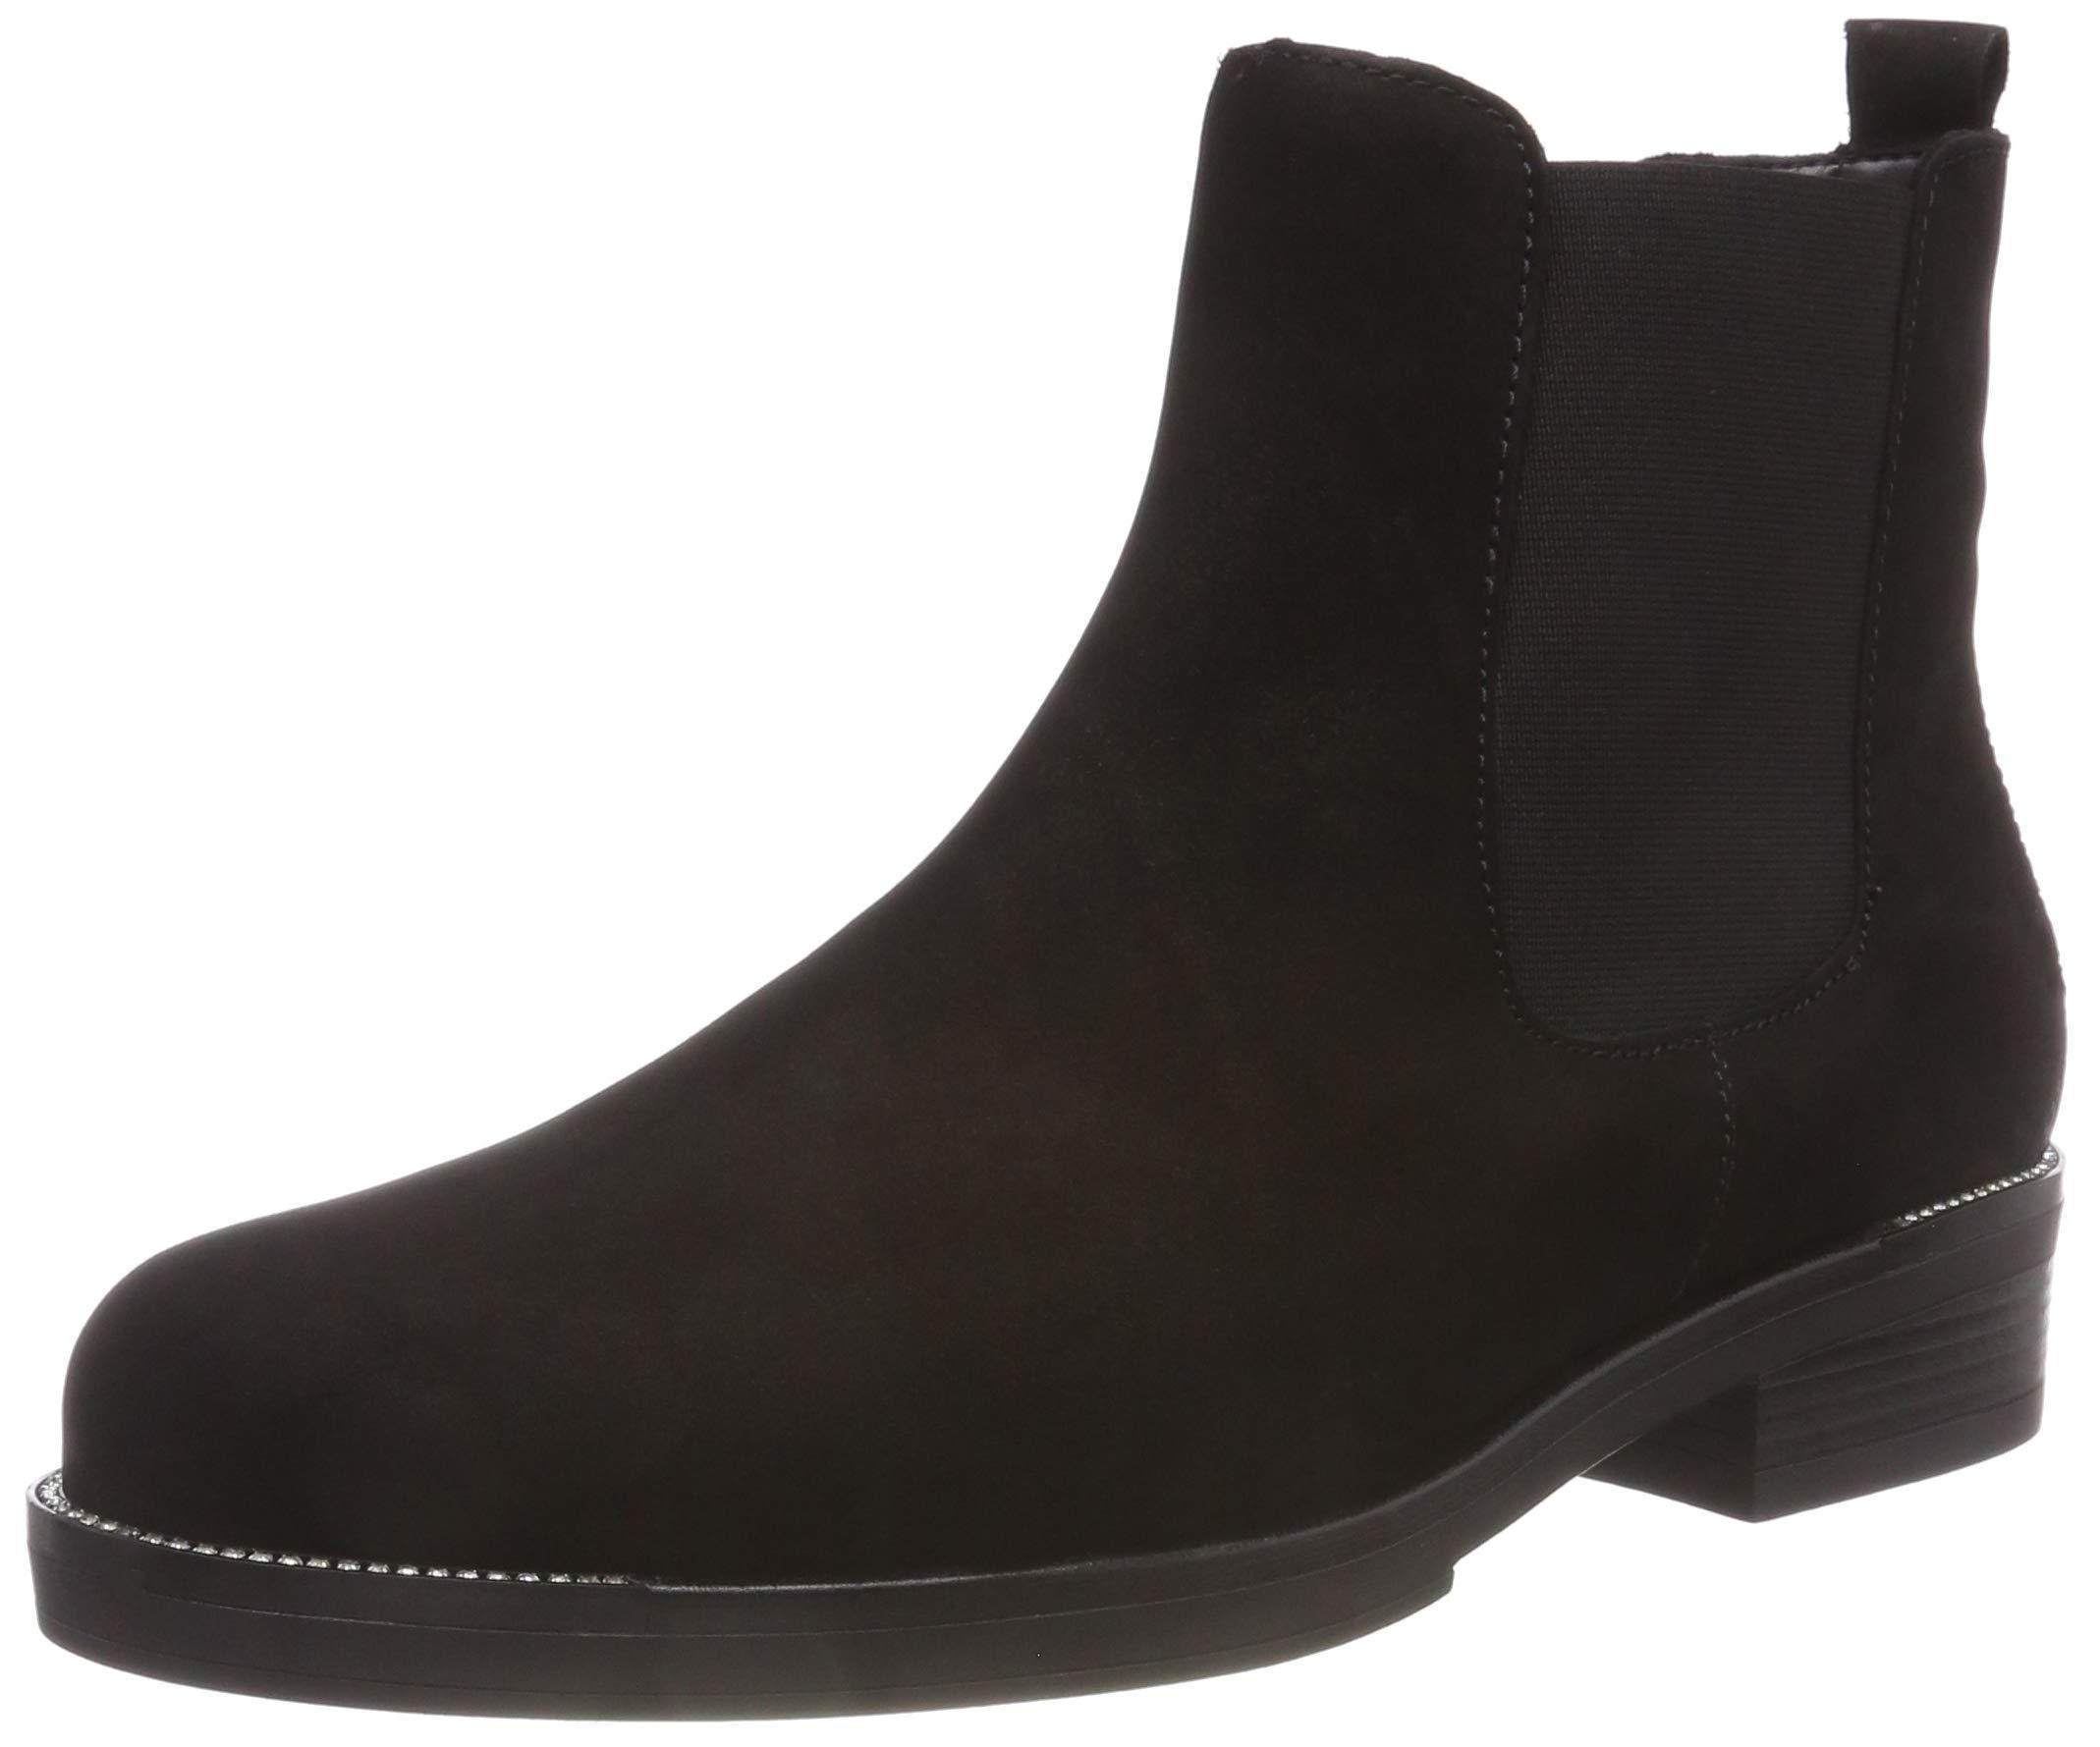 Shoes Chelsea FemmeNoirschwarzstrass1740 Eu Gabor FashionBottes AR34Lq5j